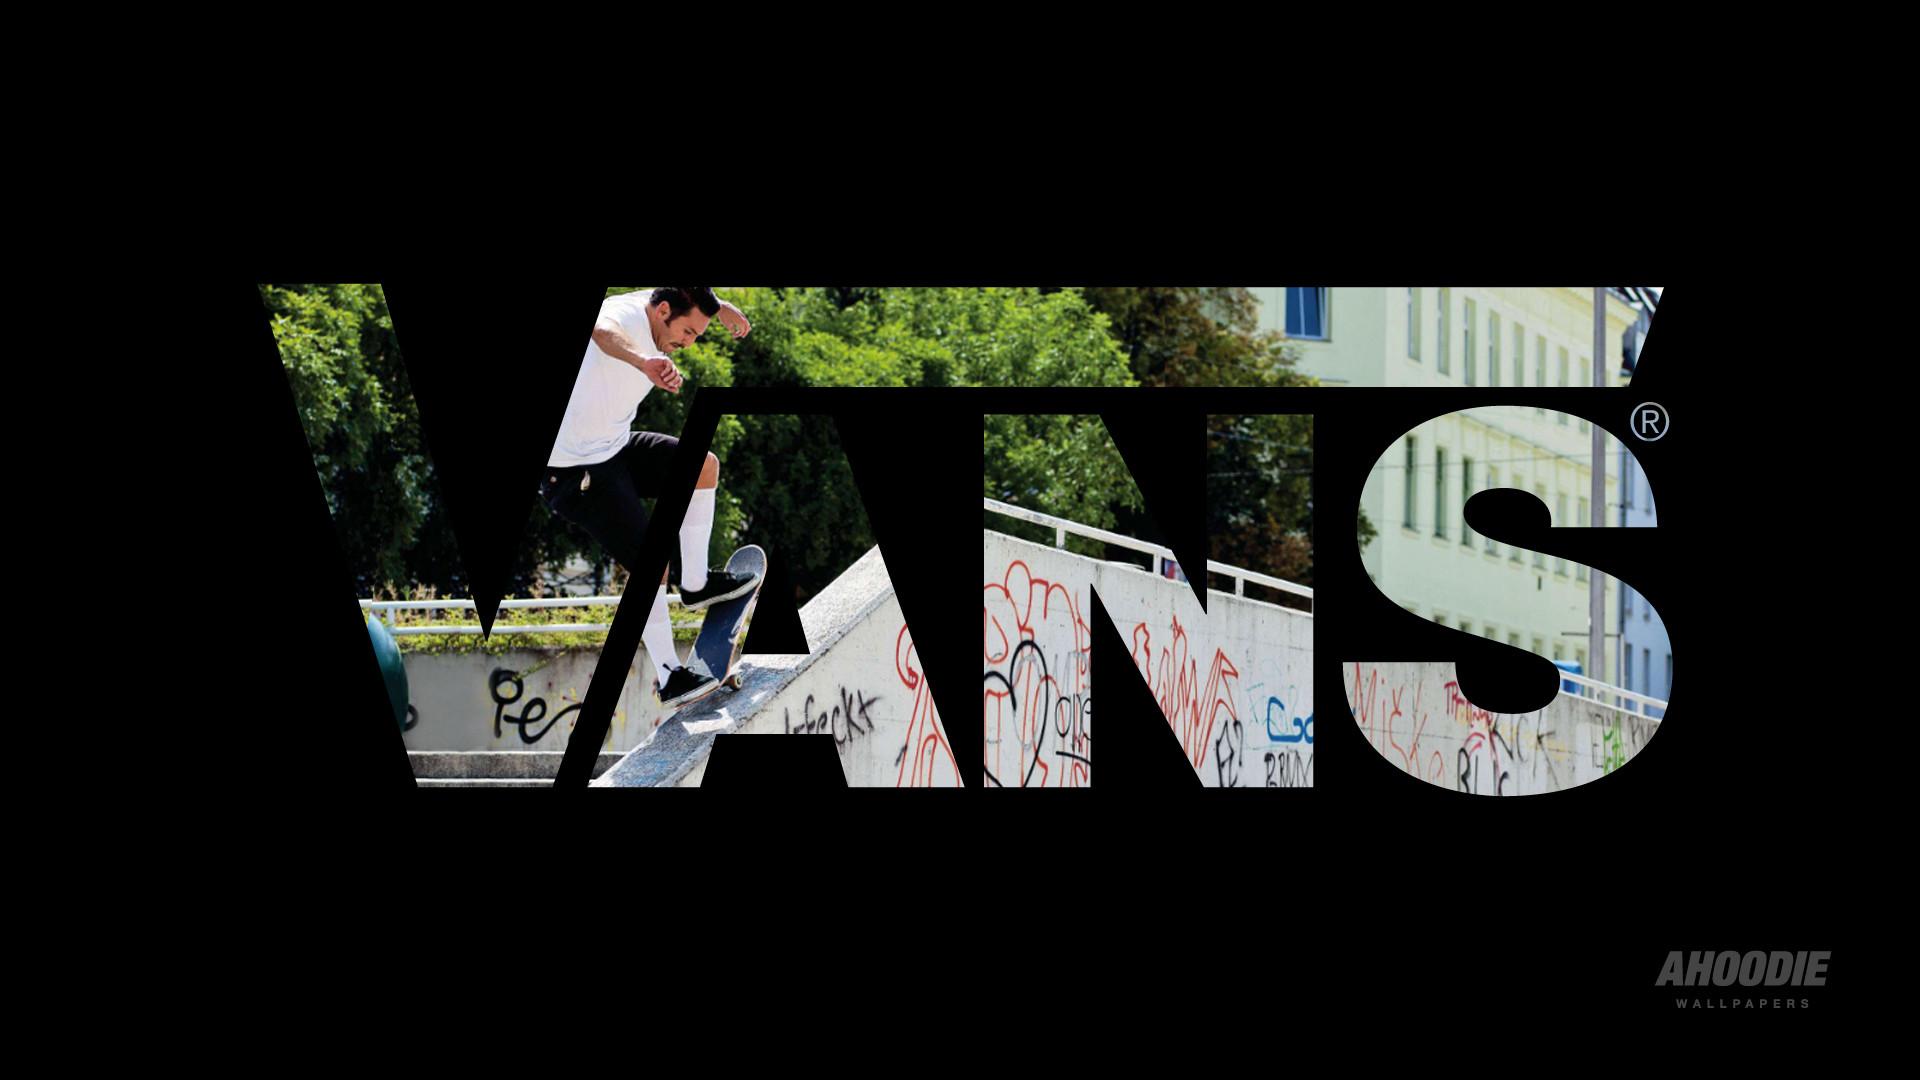 Skateboard Brand Wallpaper Hd 183 ① Wallpapertag